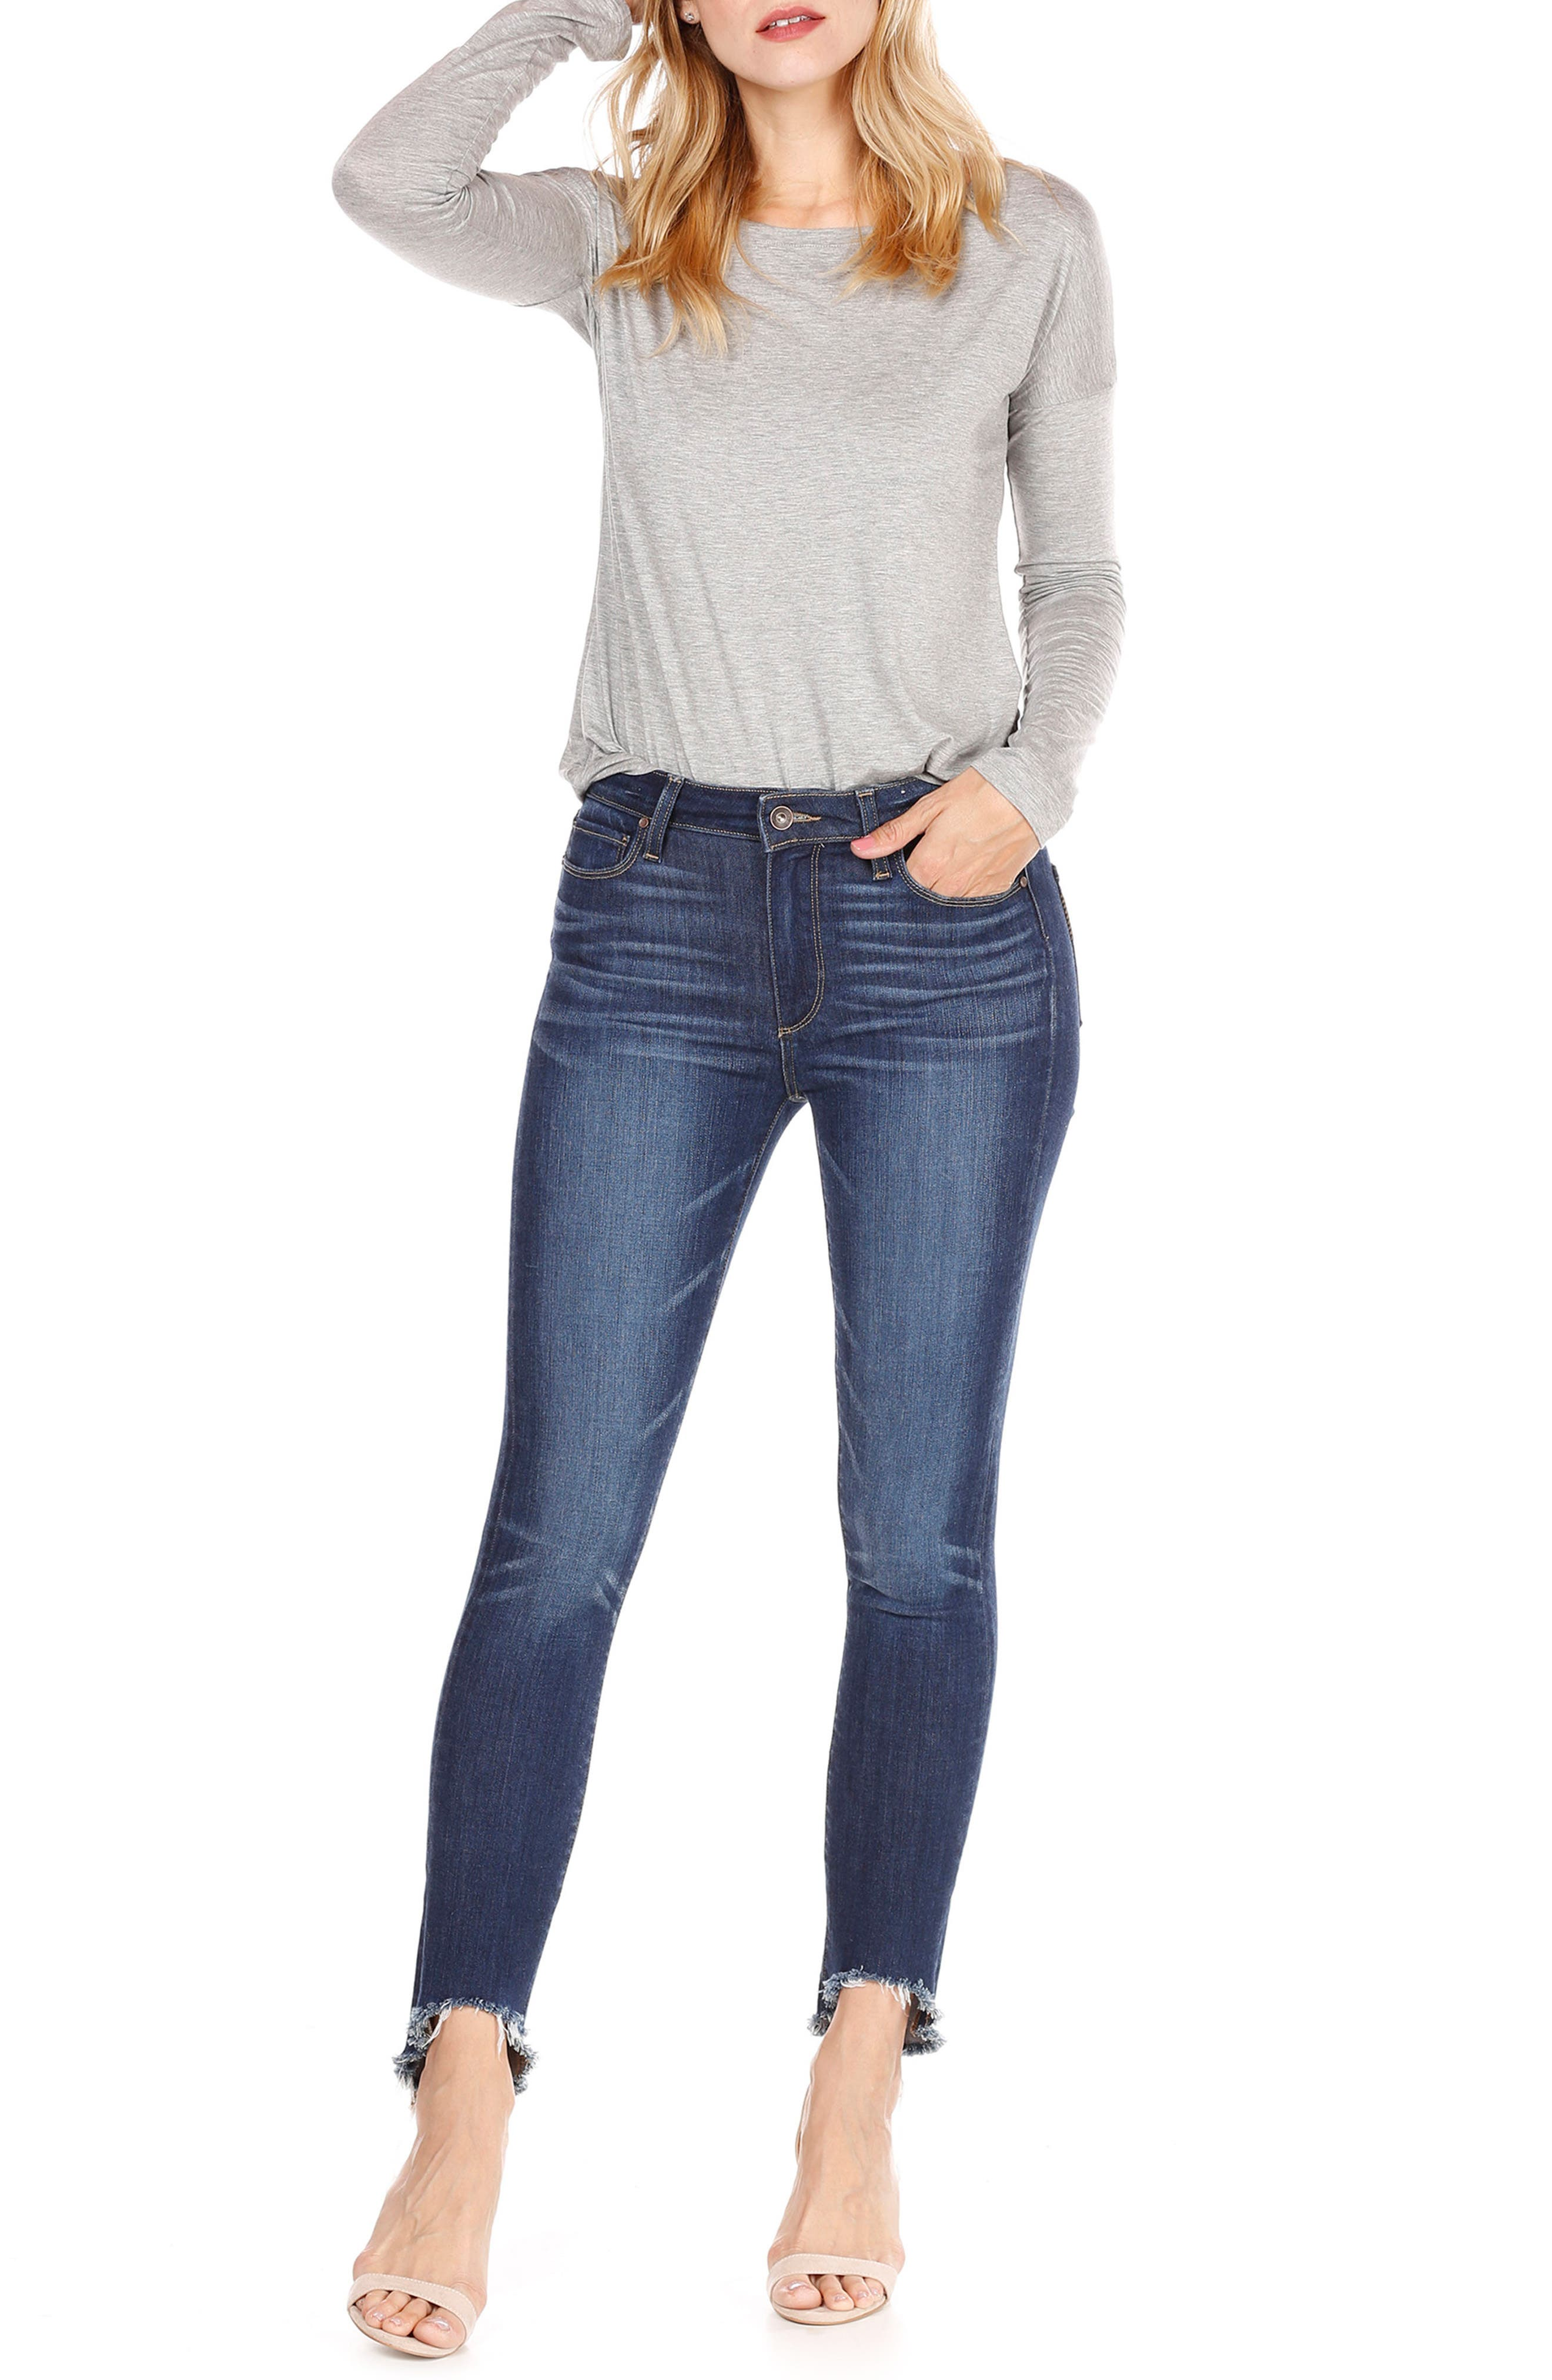 Transcend Vintage - Hoxton High Waist Ankle Skinny Jeans,                             Alternate thumbnail 3, color,                             400